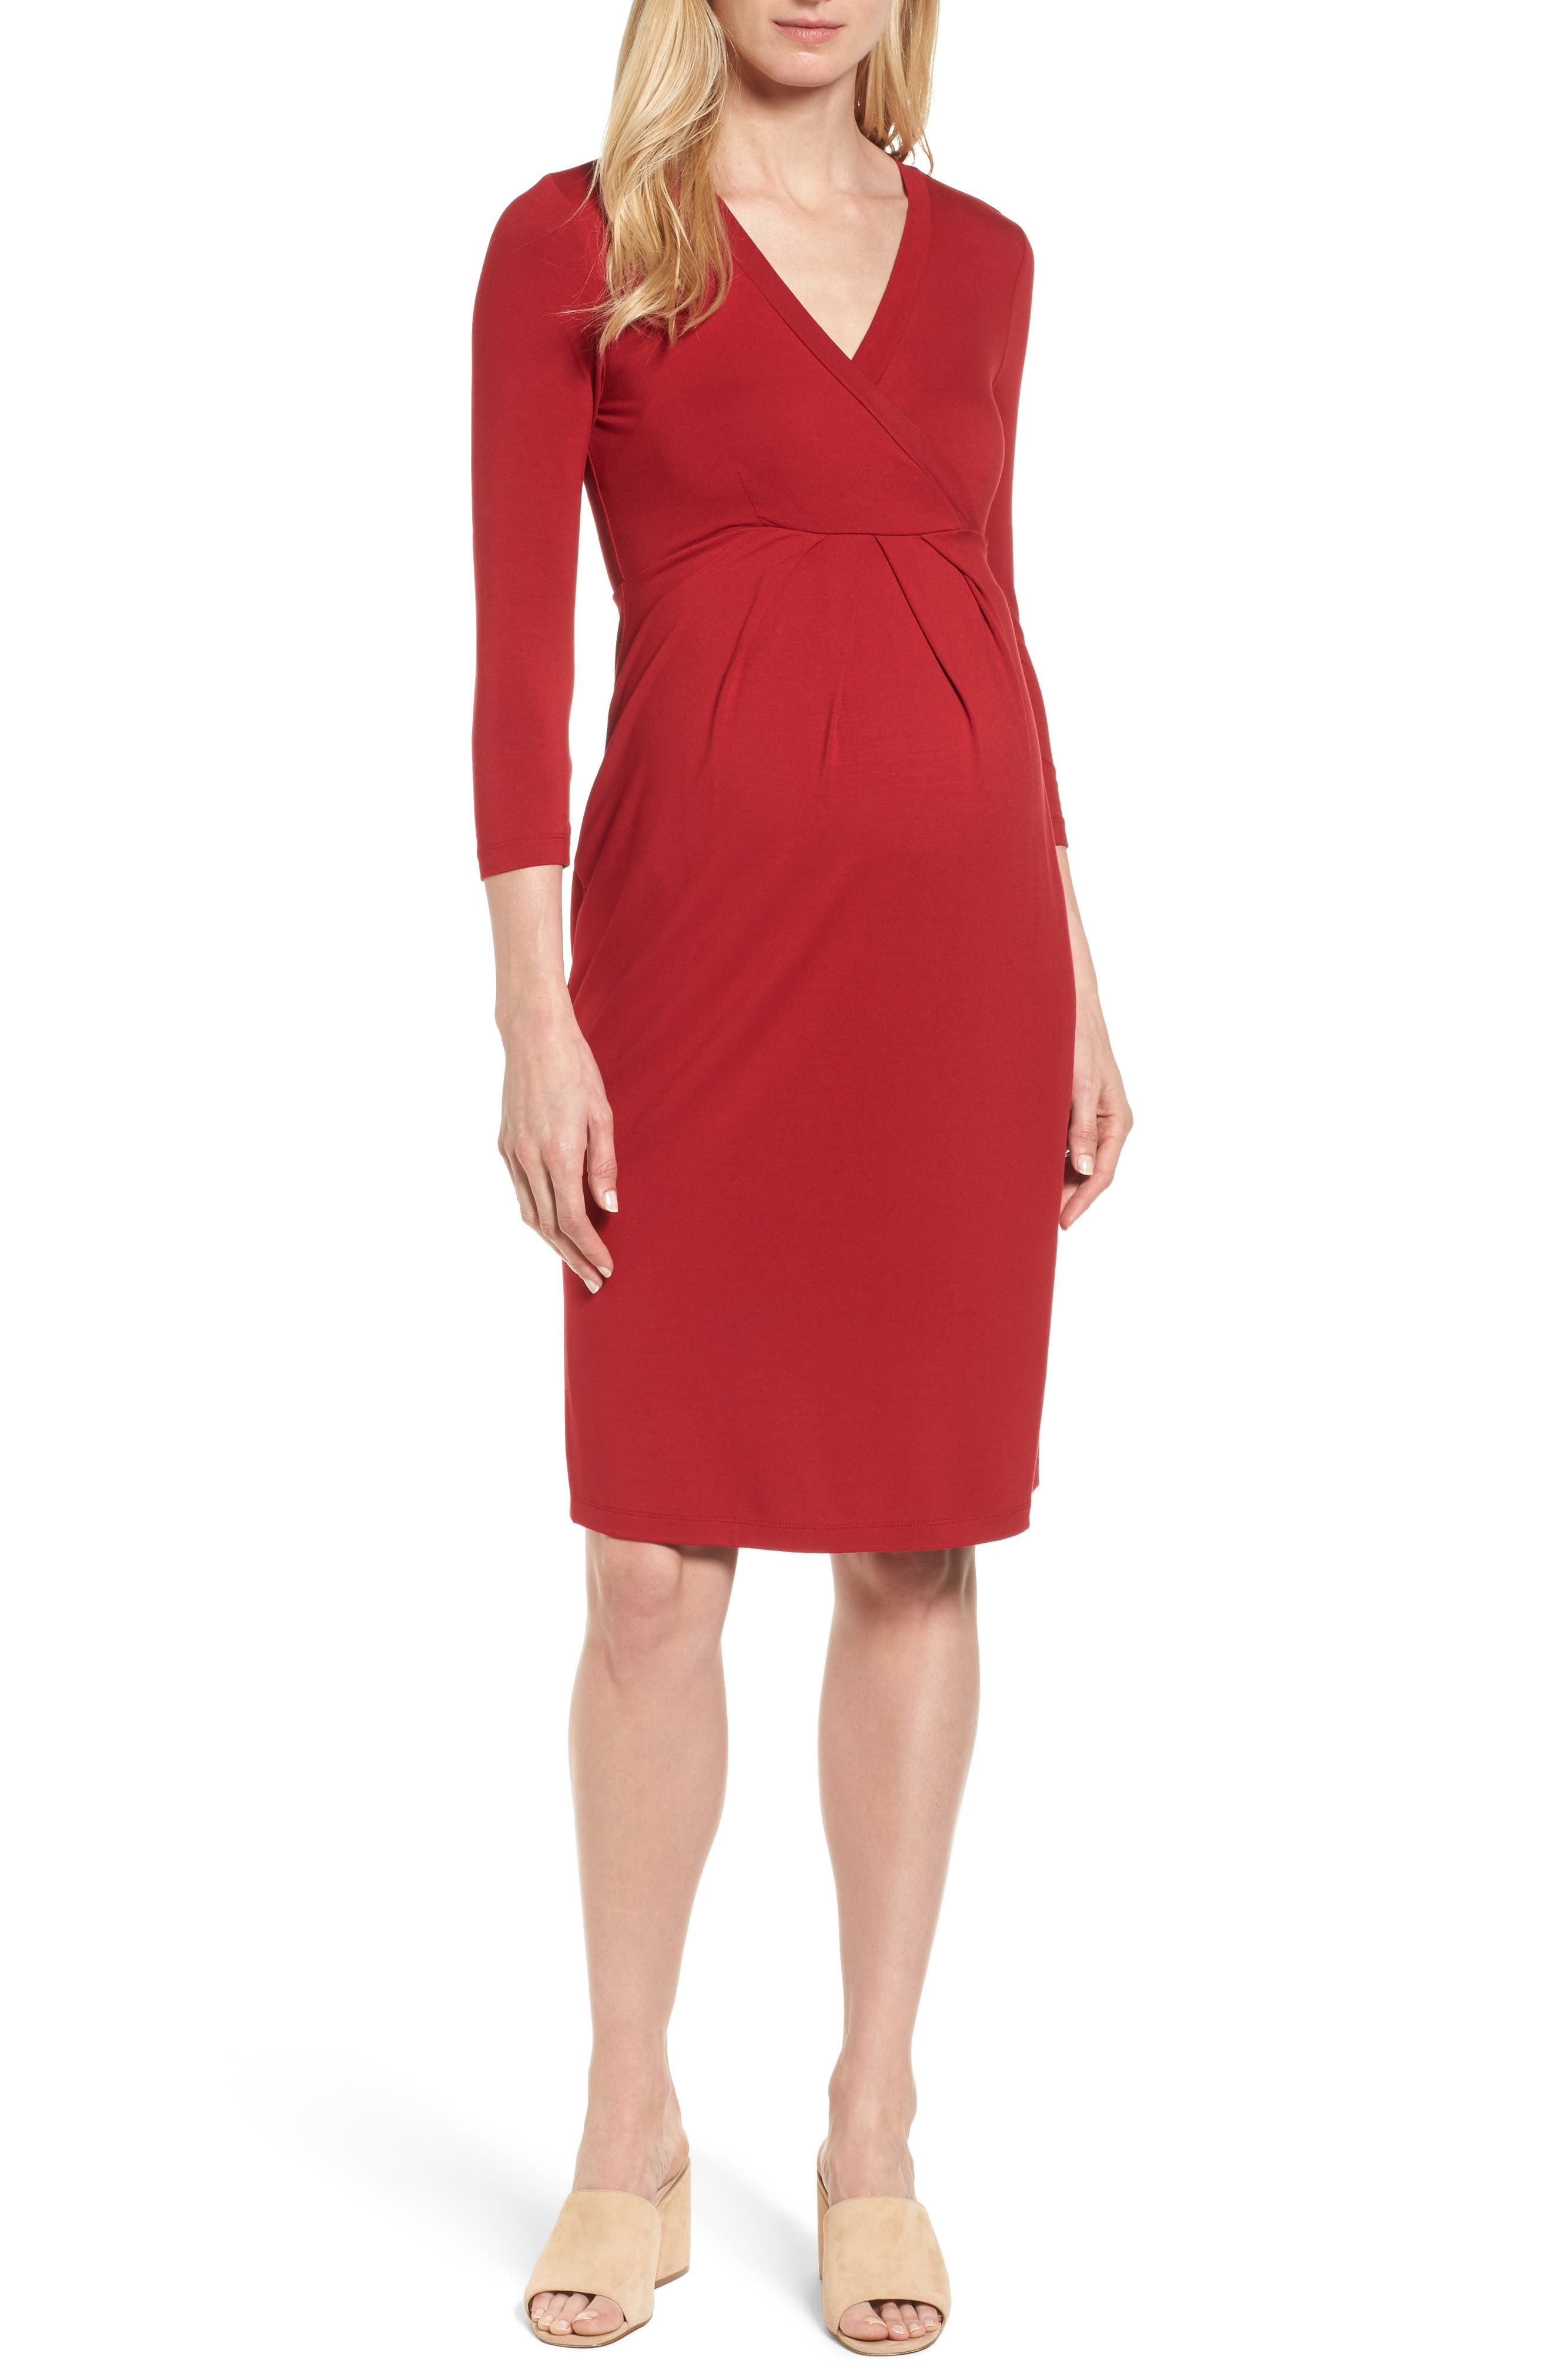 ISABELLA OLIVER,                             Gracia Surplice Maternity Dress,                             Main thumbnail 1, color,                             CARDAMOM RED